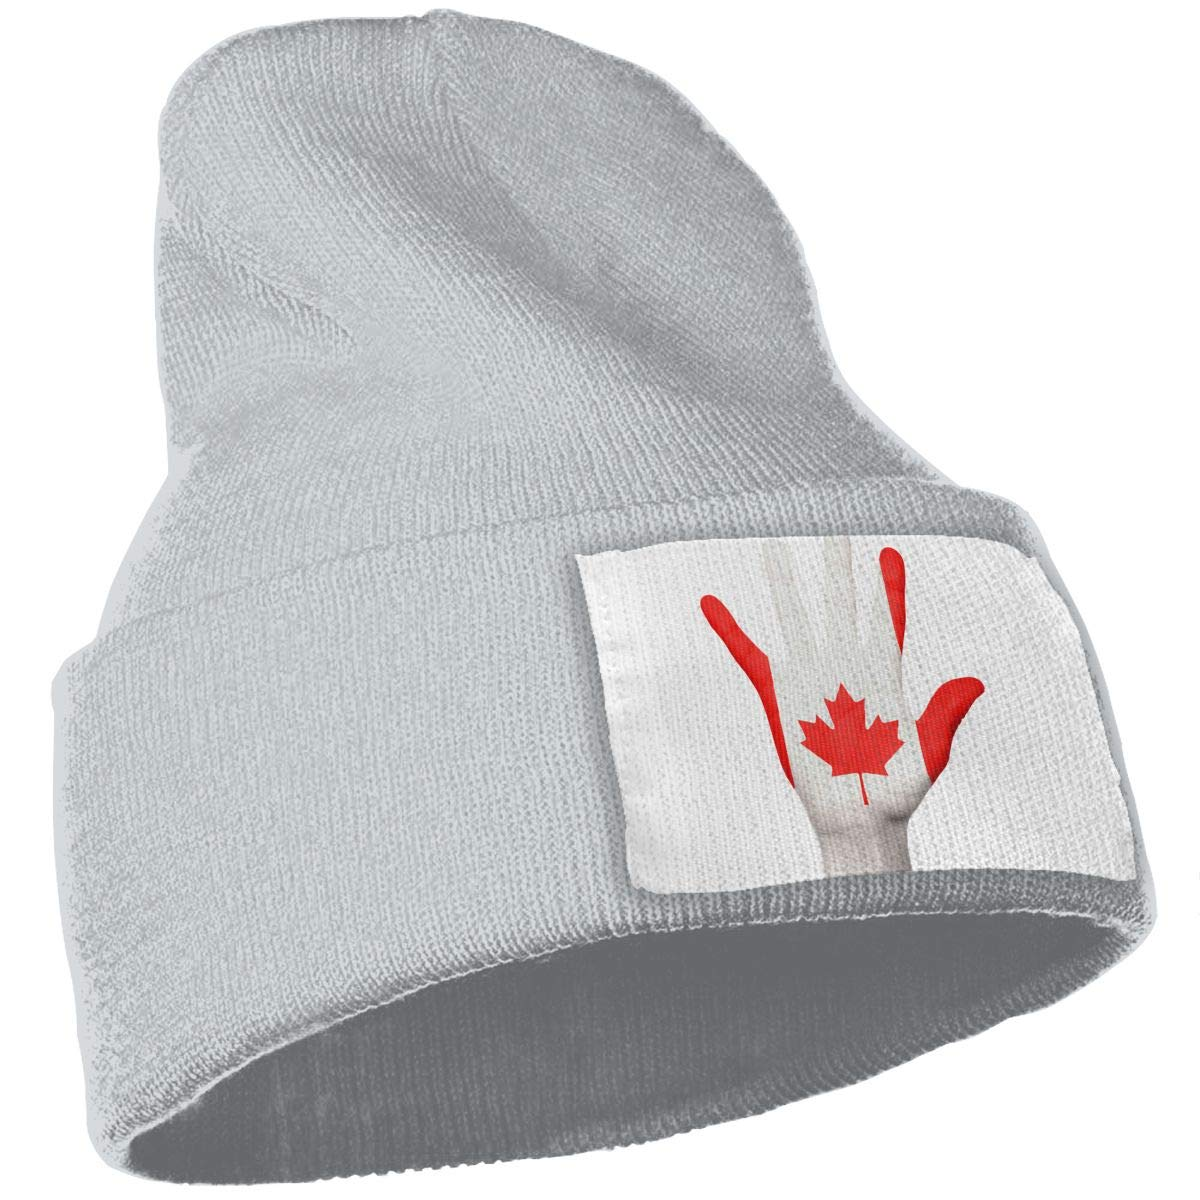 Canada Flag Canadian Maple Leaf Unisex Fashion Knitted Hat Luxury Hip-Hop Cap